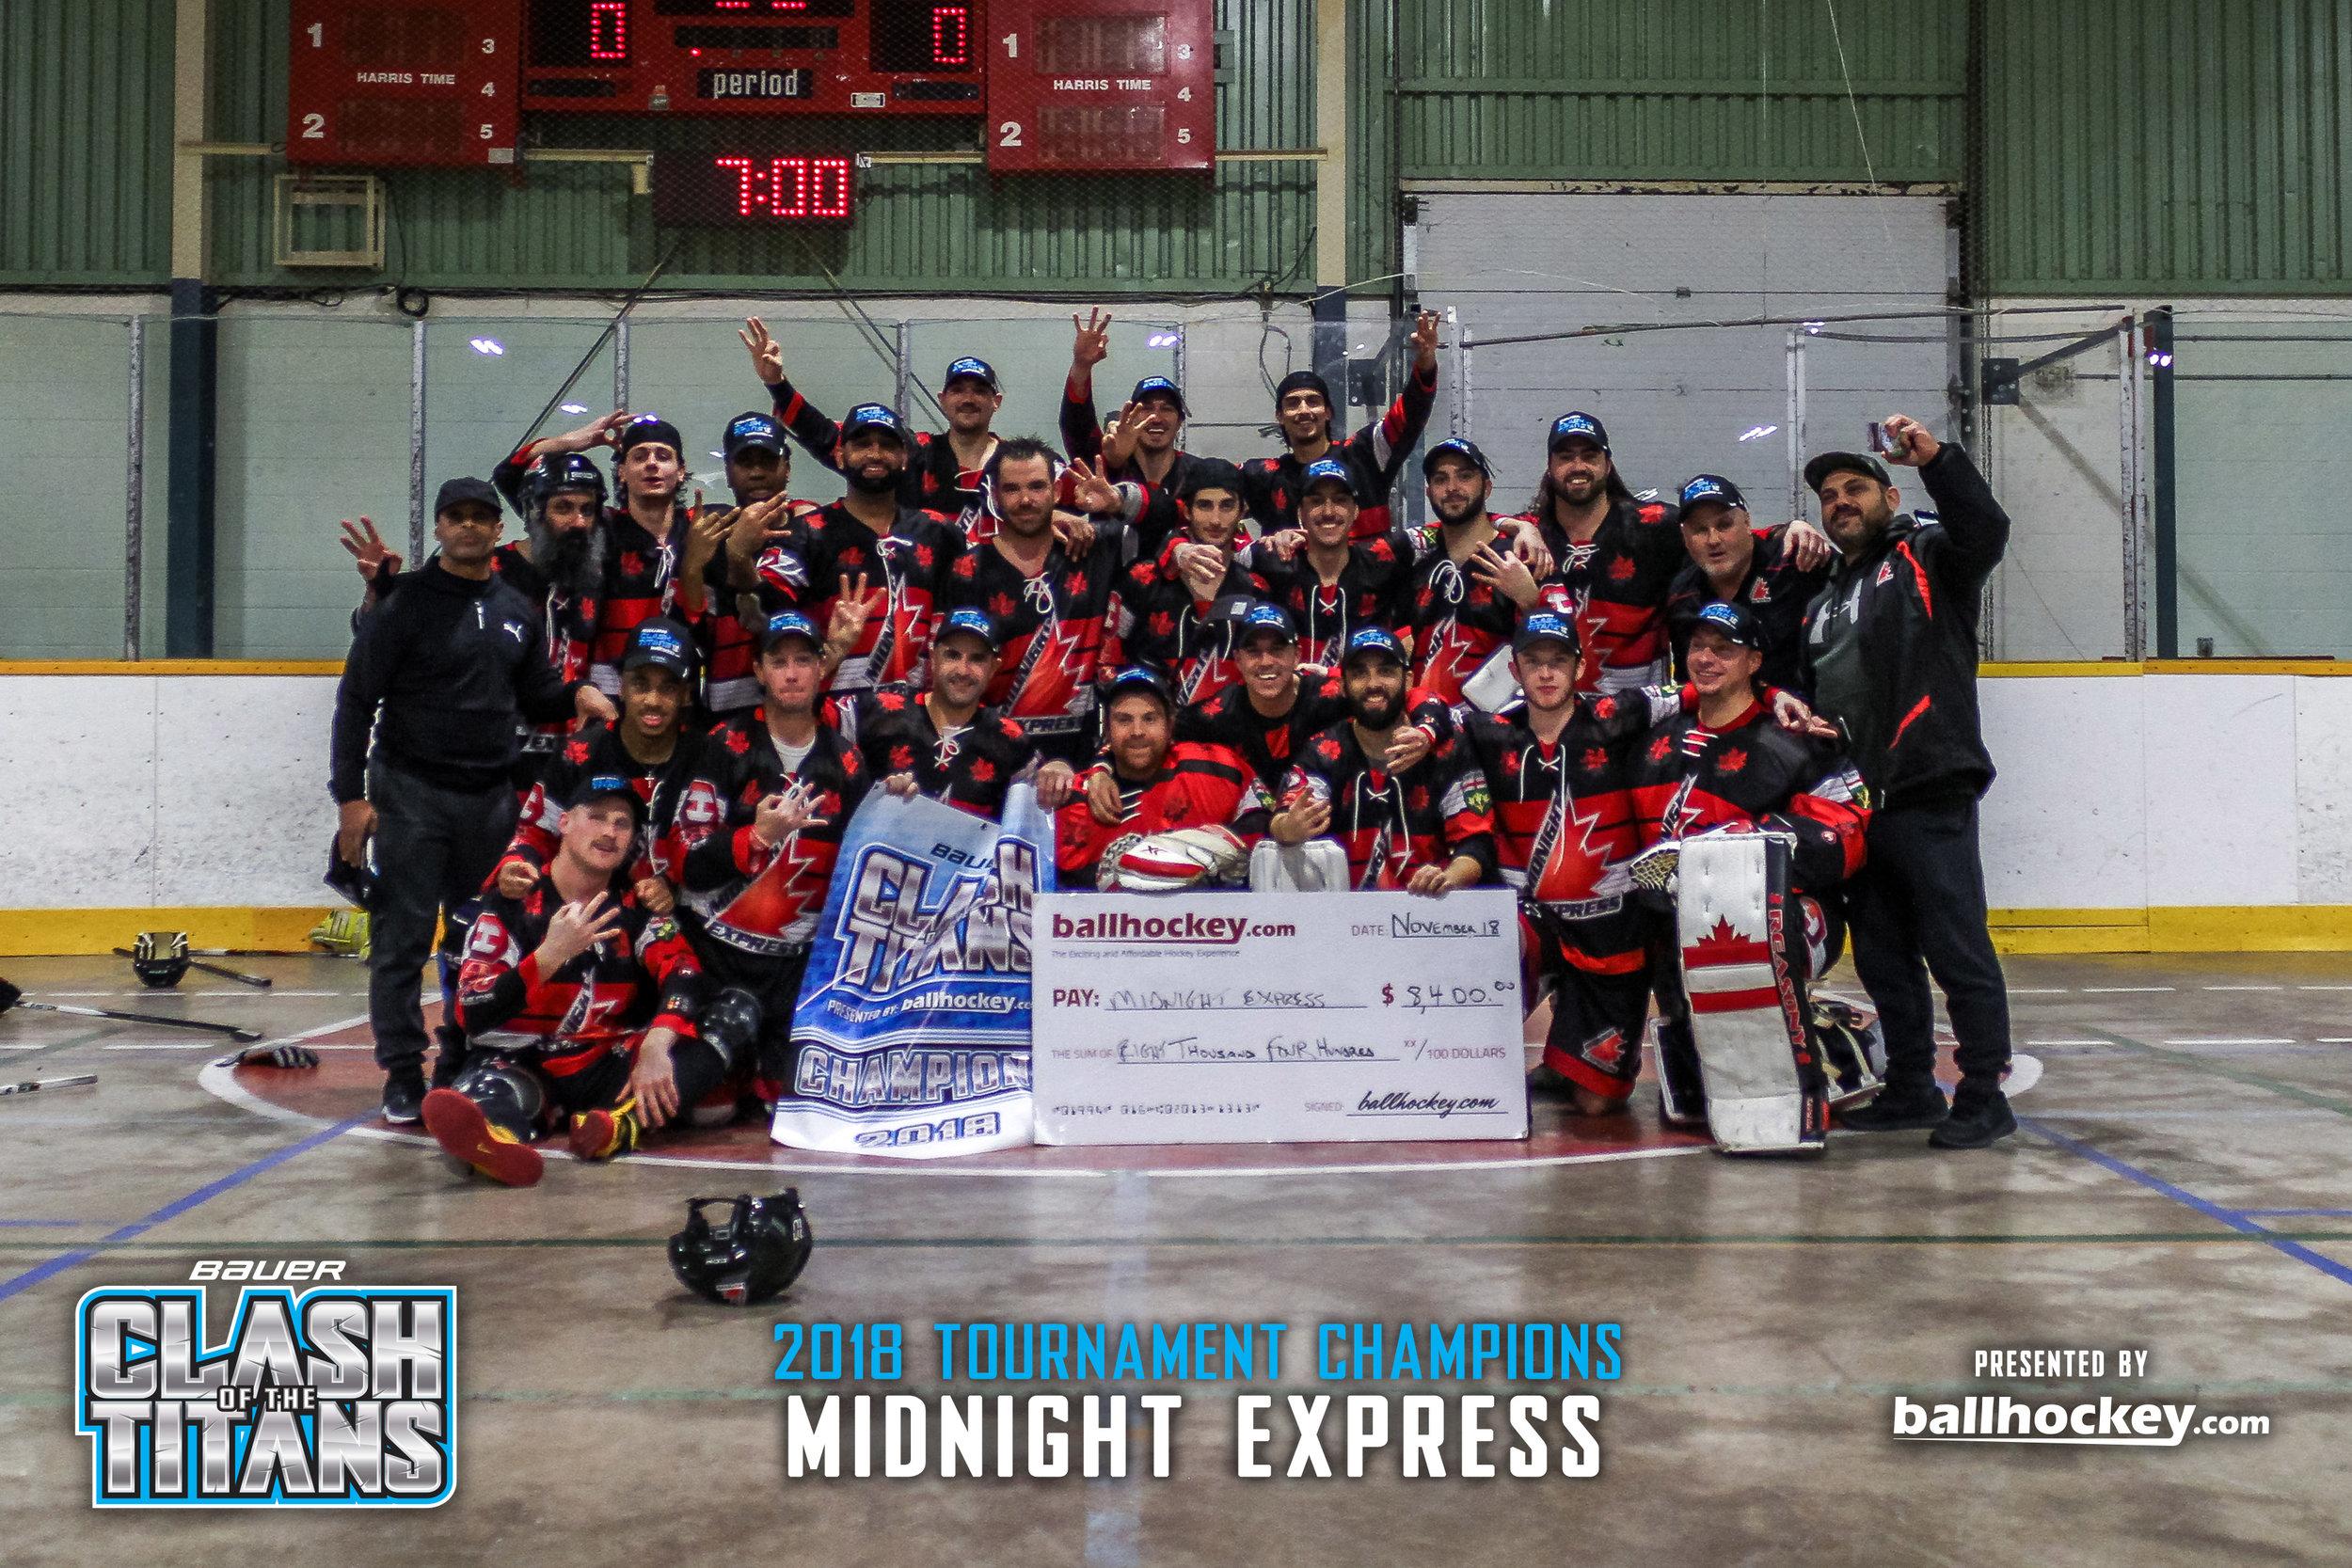 2018 Bauer Clash of the Titans Champions - Brampton Midnight Express